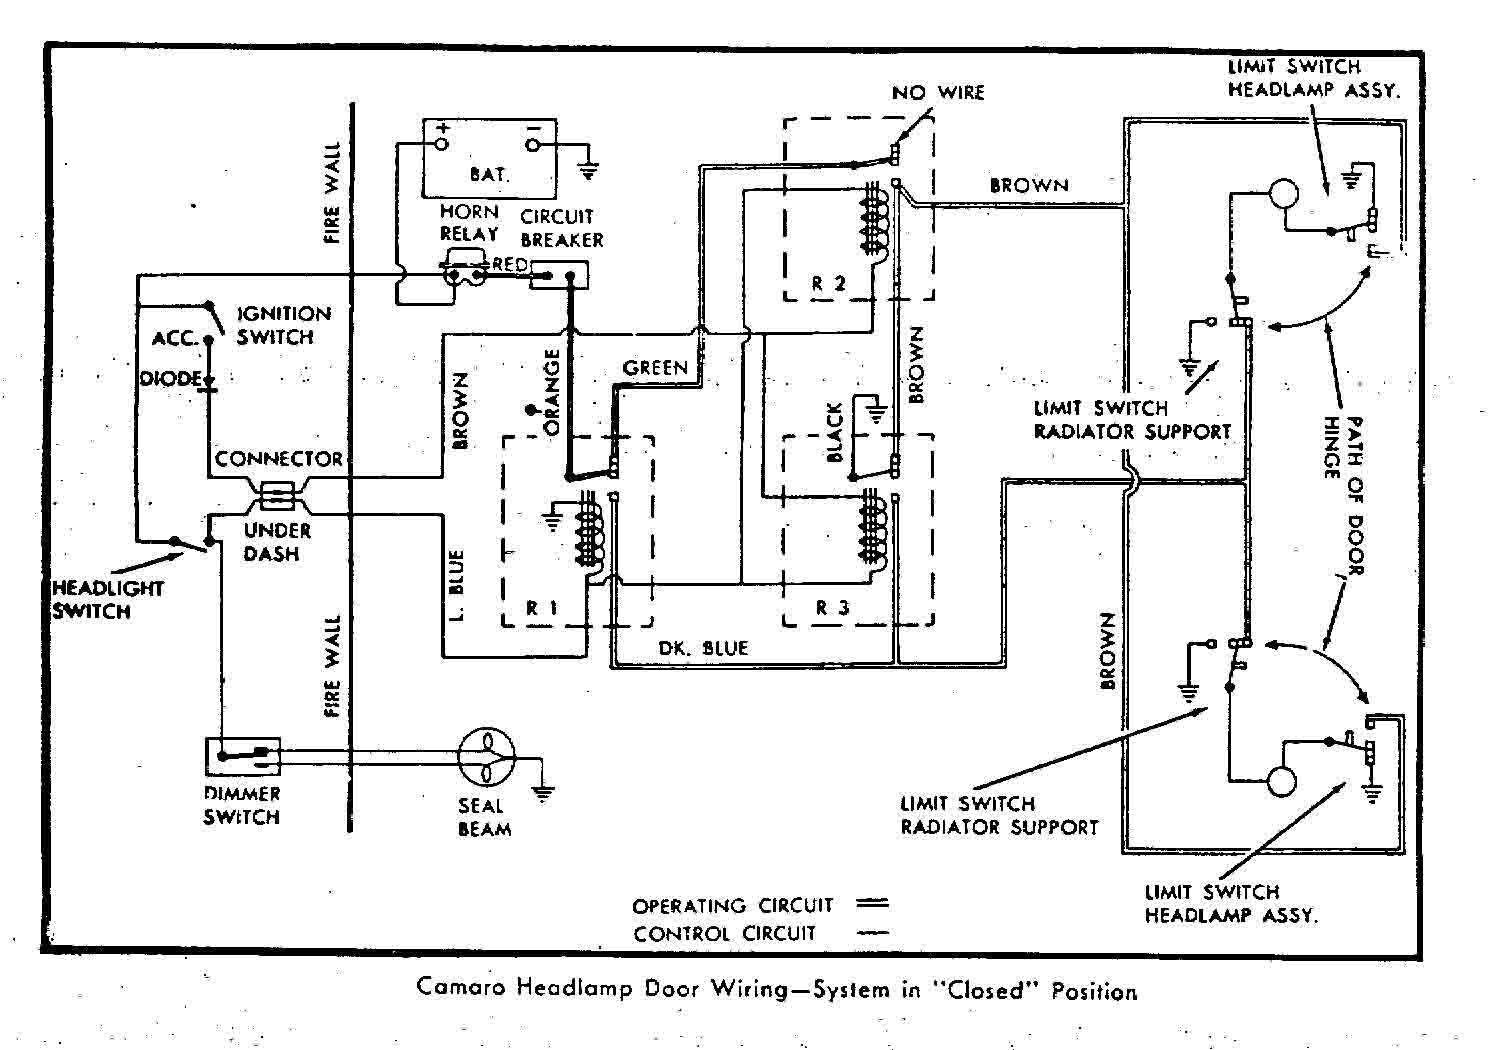 67 Mustang Gt Tachometer Wiring